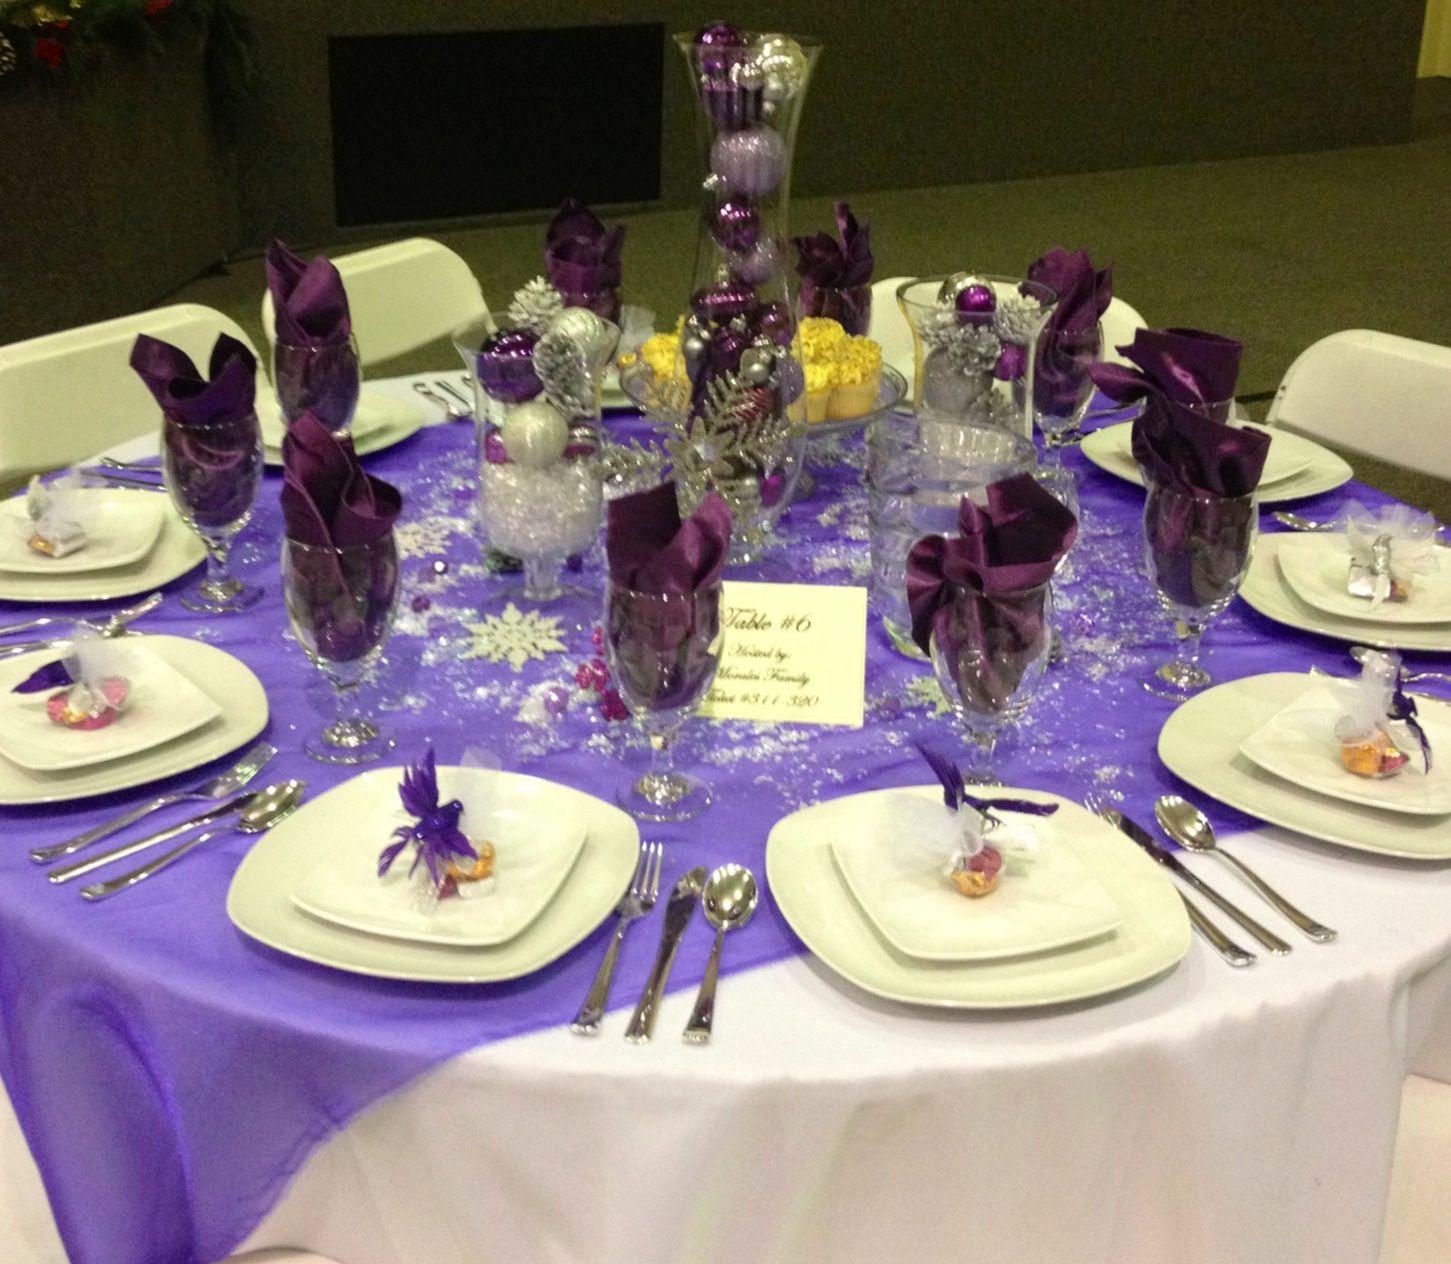 Purple And Silver Christmas Table Settings Purple Table Settings Wedding Table Settings Table Settings